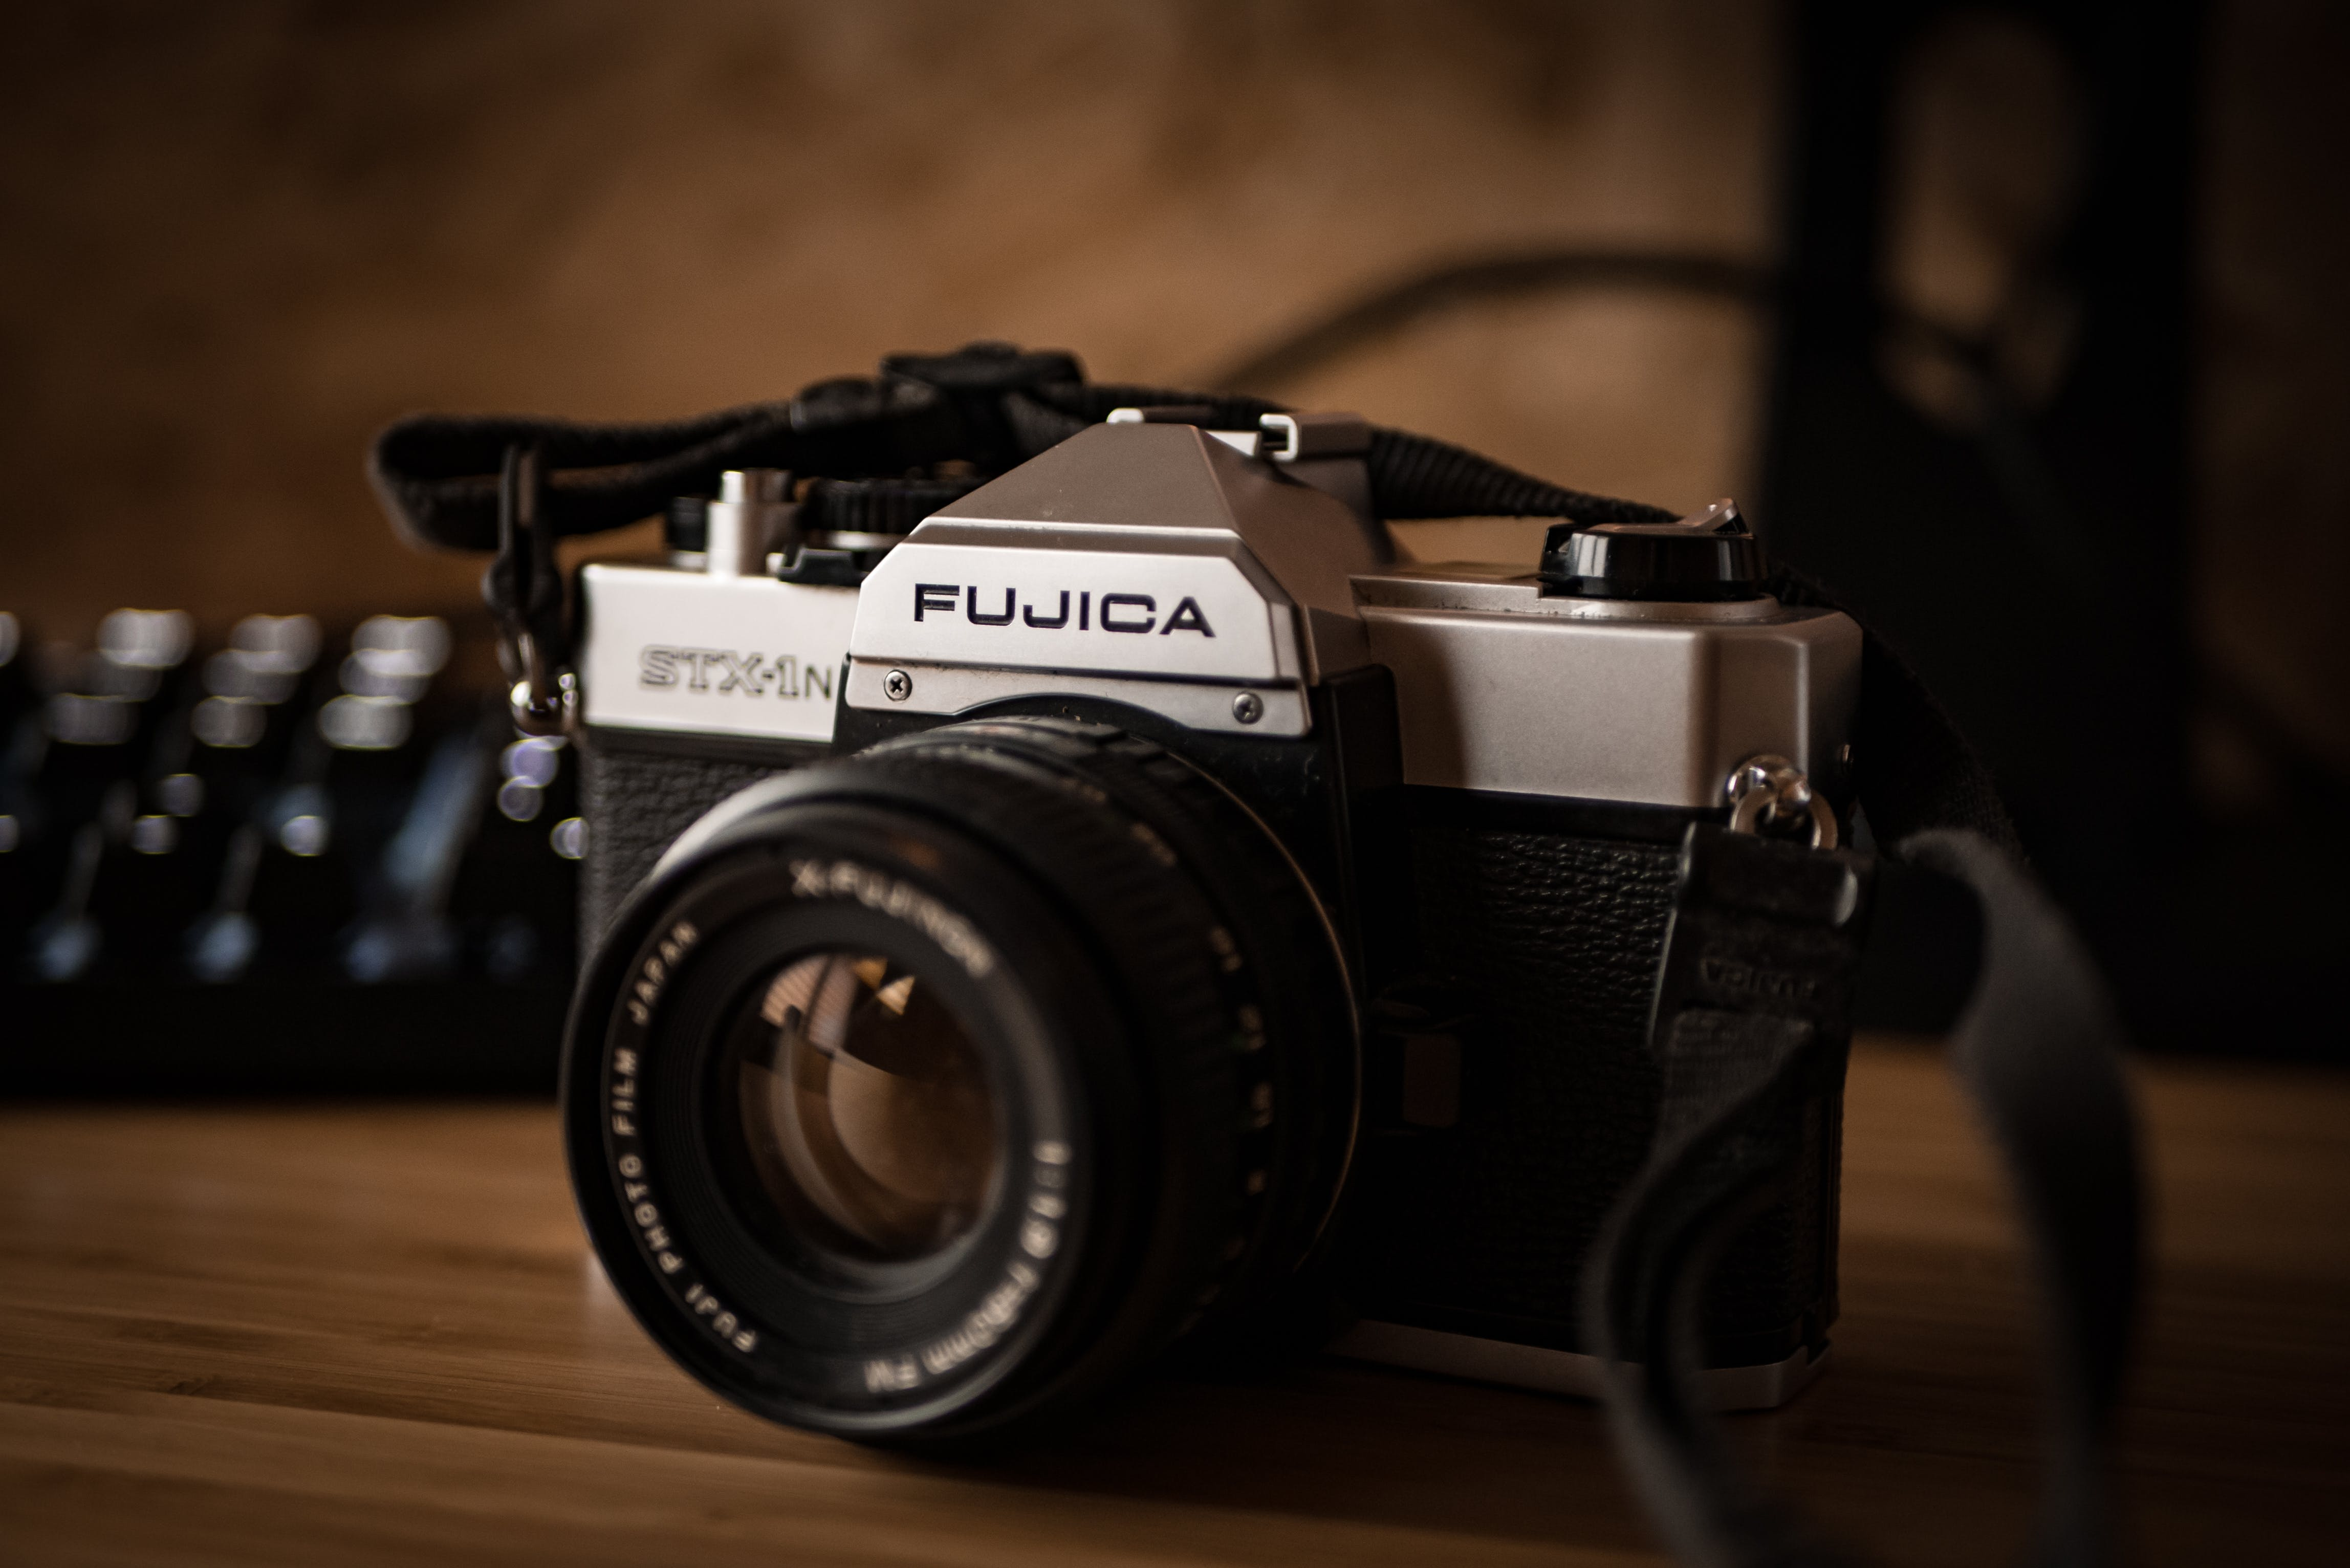 Free stock photo of film, filmcamera, fujica, fujifilm